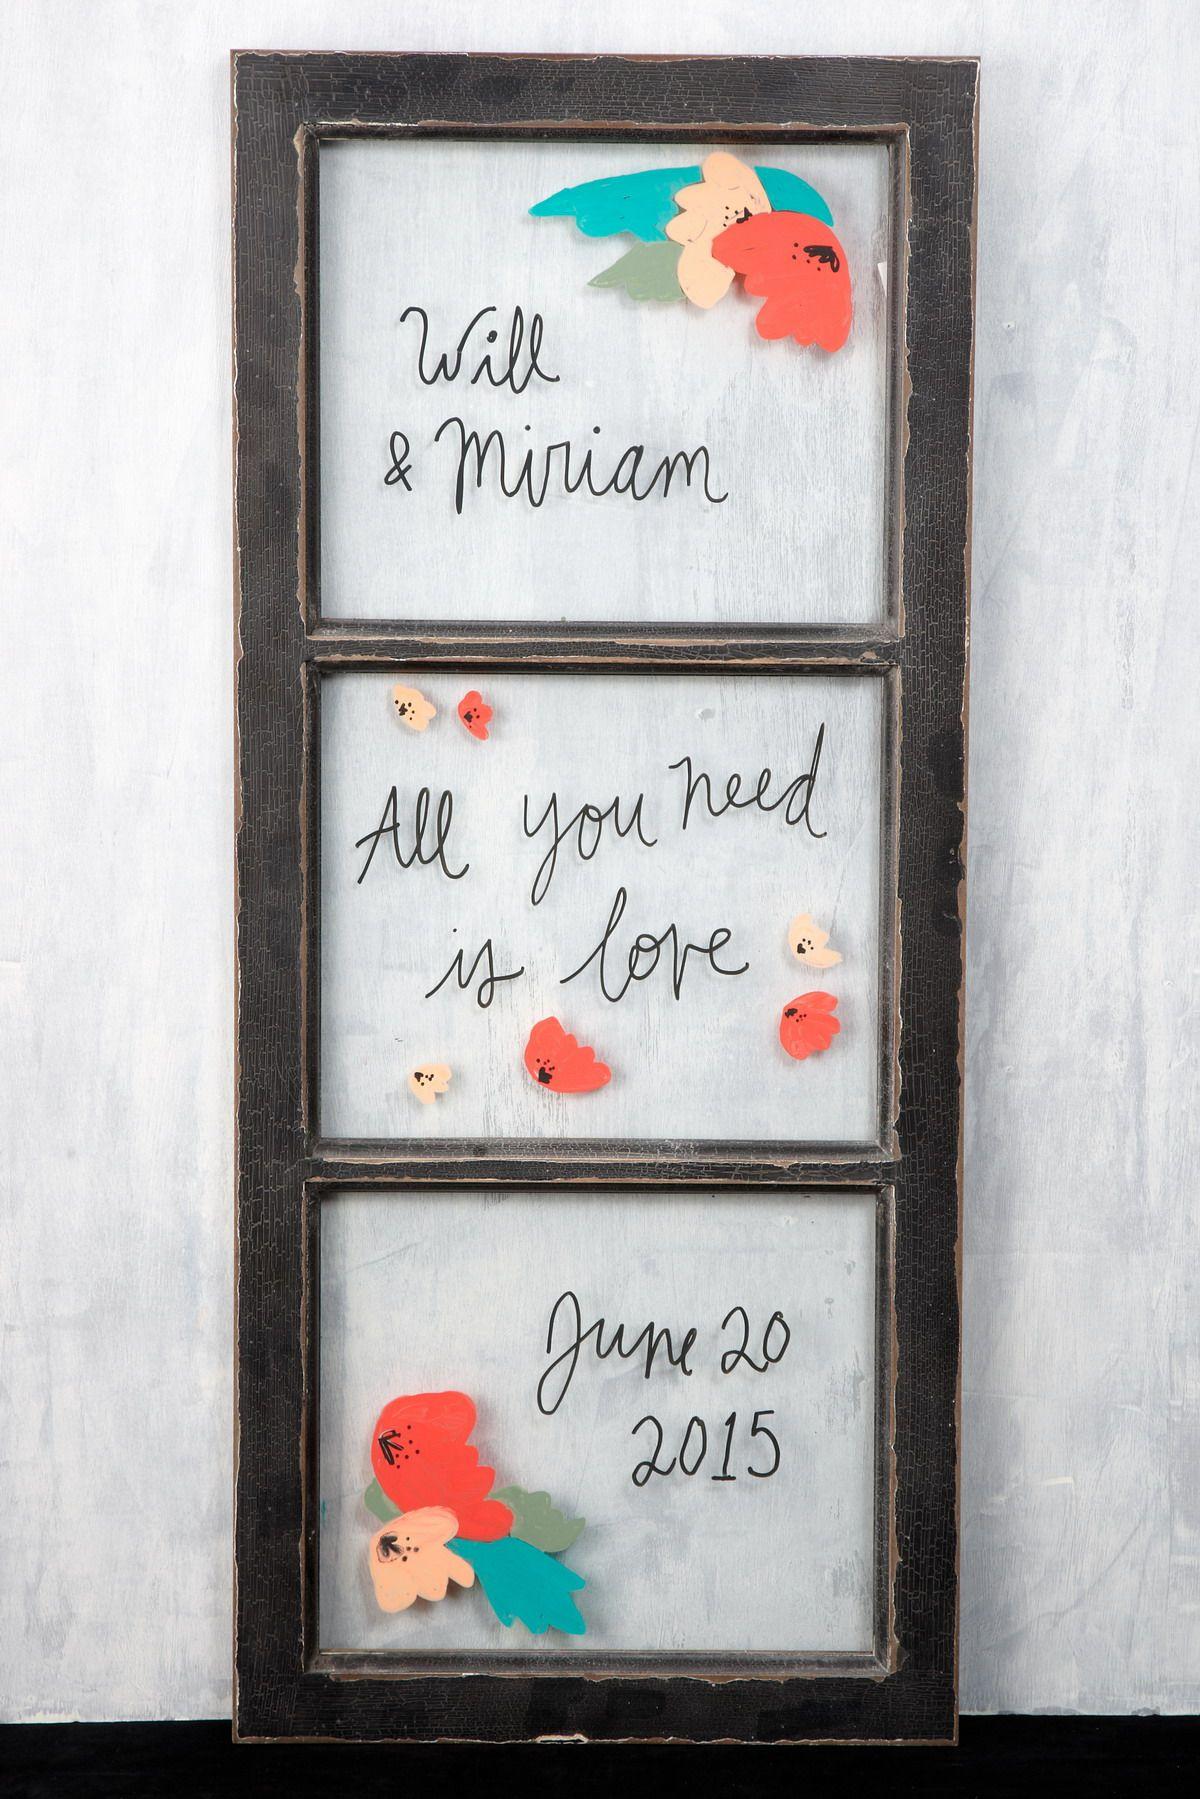 Window pane ideas  wedding signage on a window pane  wedding sign ideas  pinterest